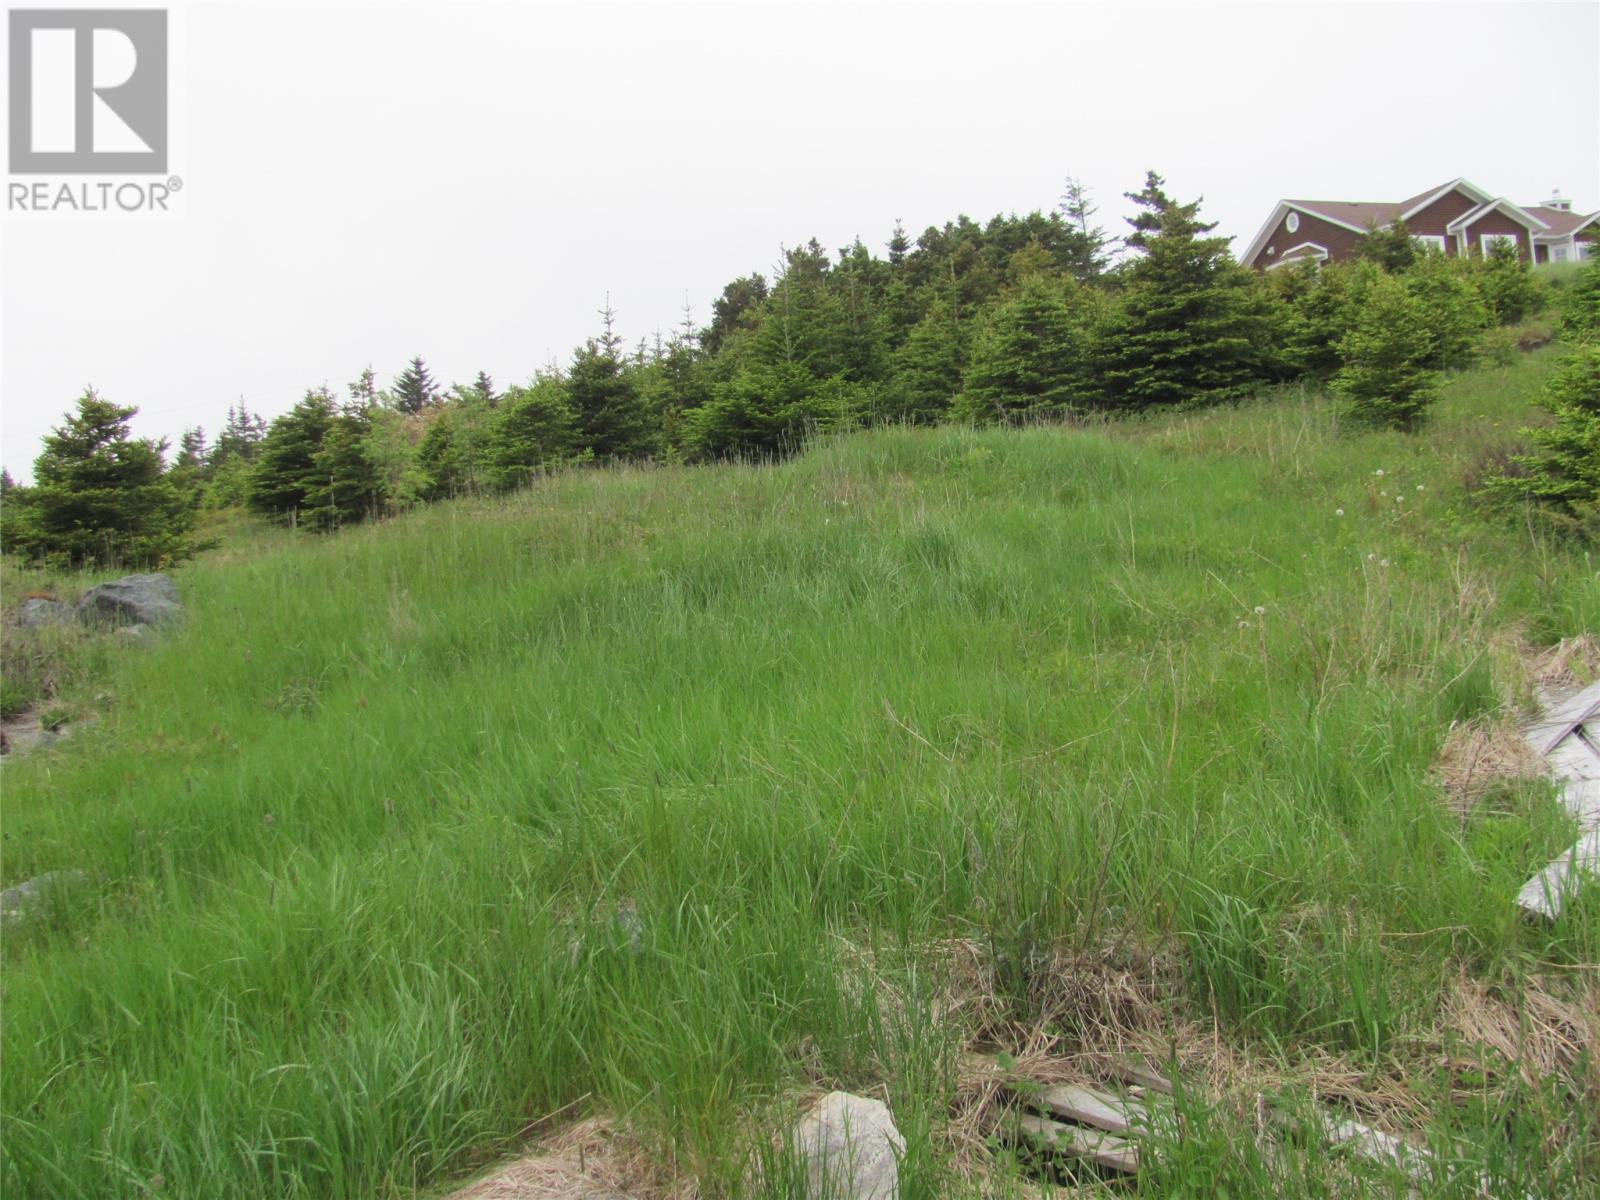 72 John Cabot Drive, Bonavista, Newfoundland & Labrador  A0C 1B0 - Photo 6 - 1197415